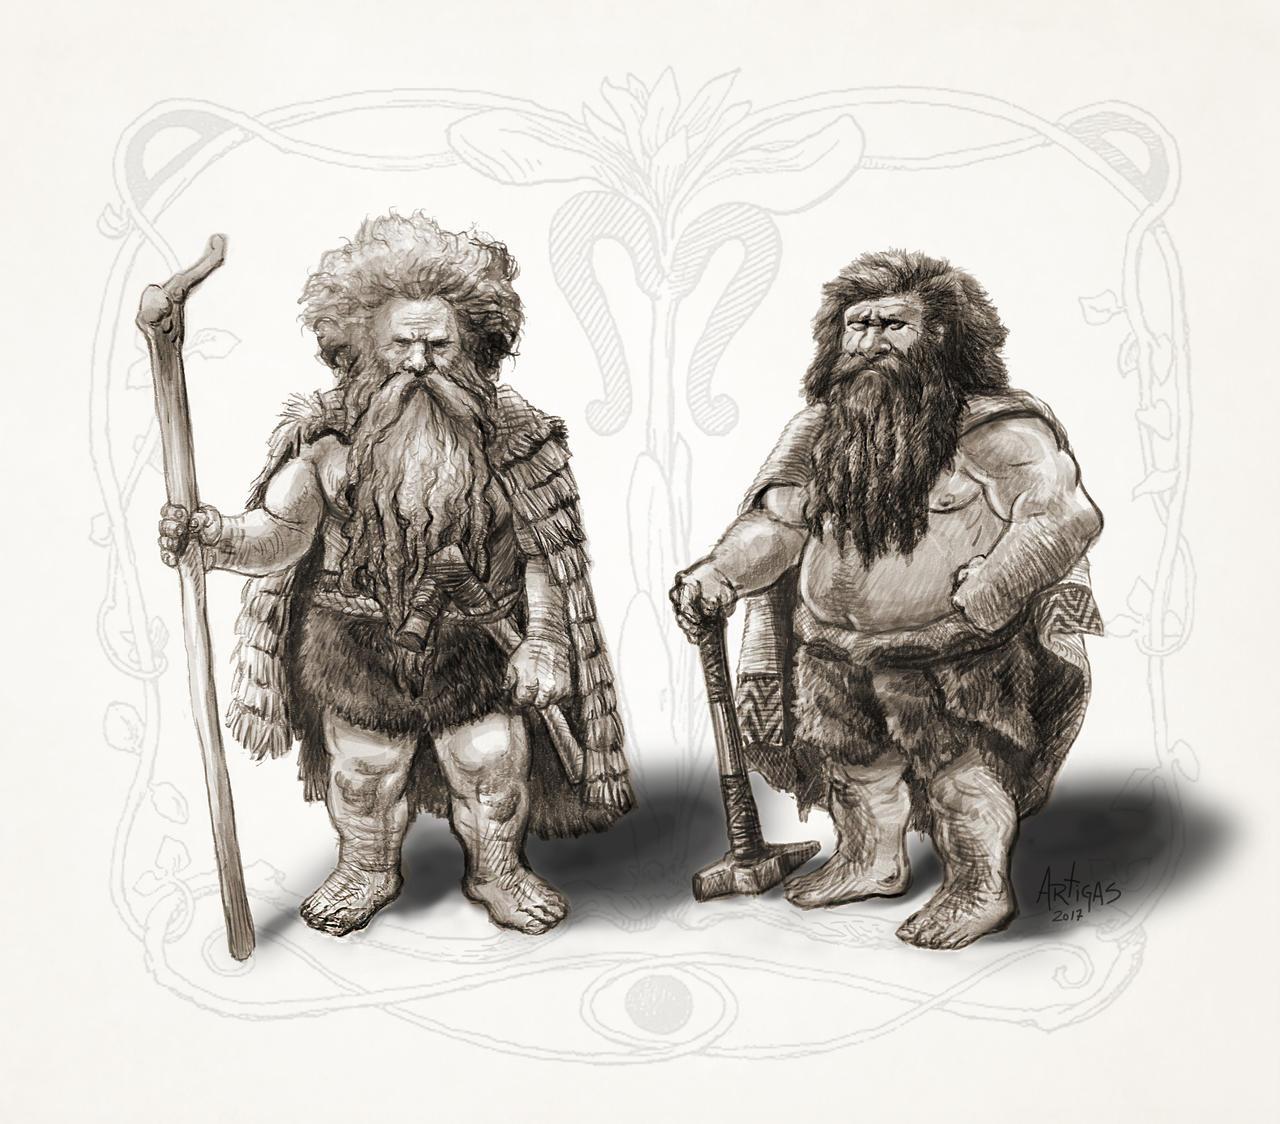 Primitive Dwarfs